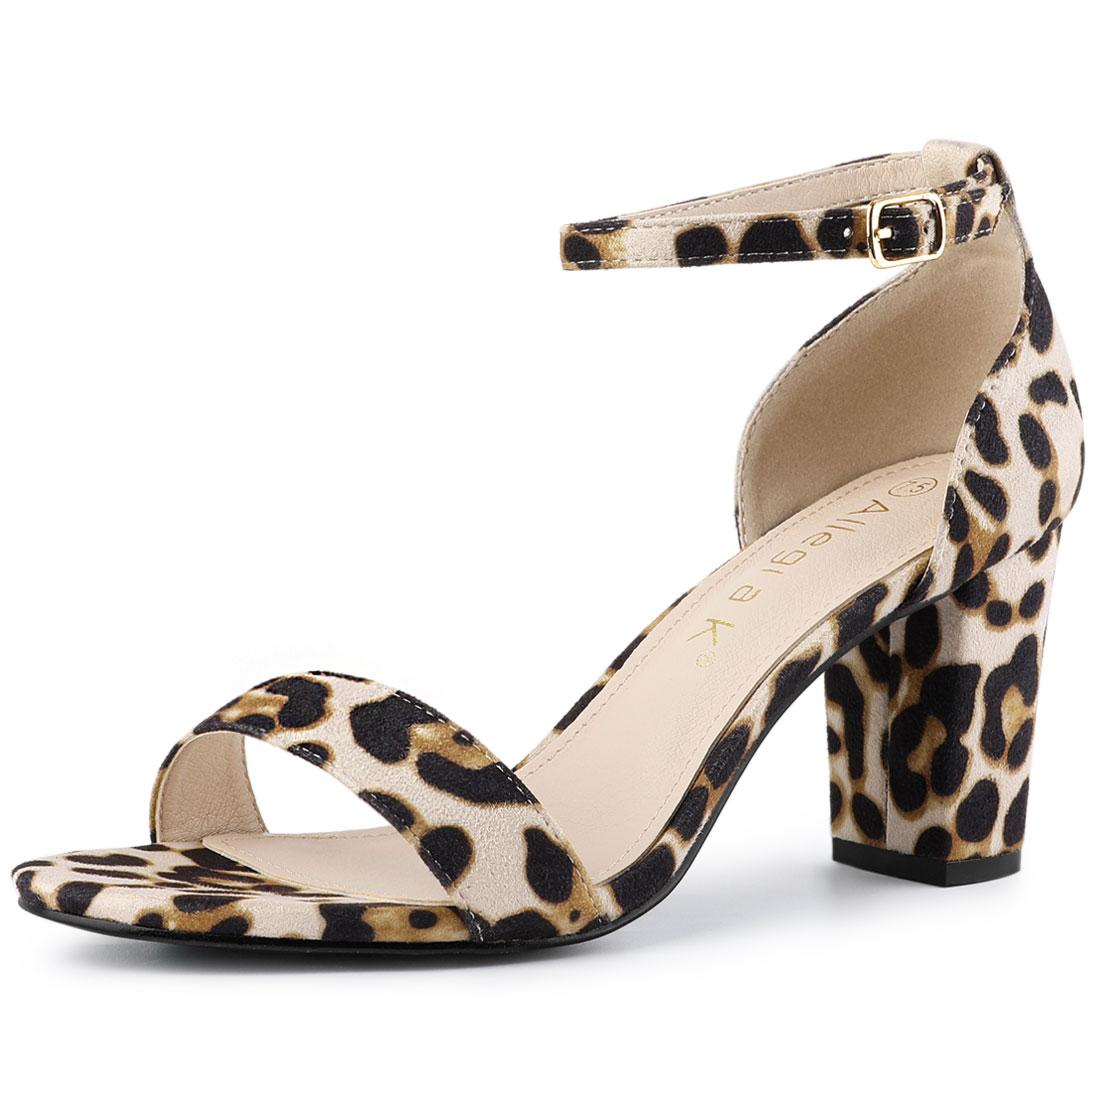 Allegra K Women's Ankle Strap Chunky High Heel Sandals White Leopard US 9